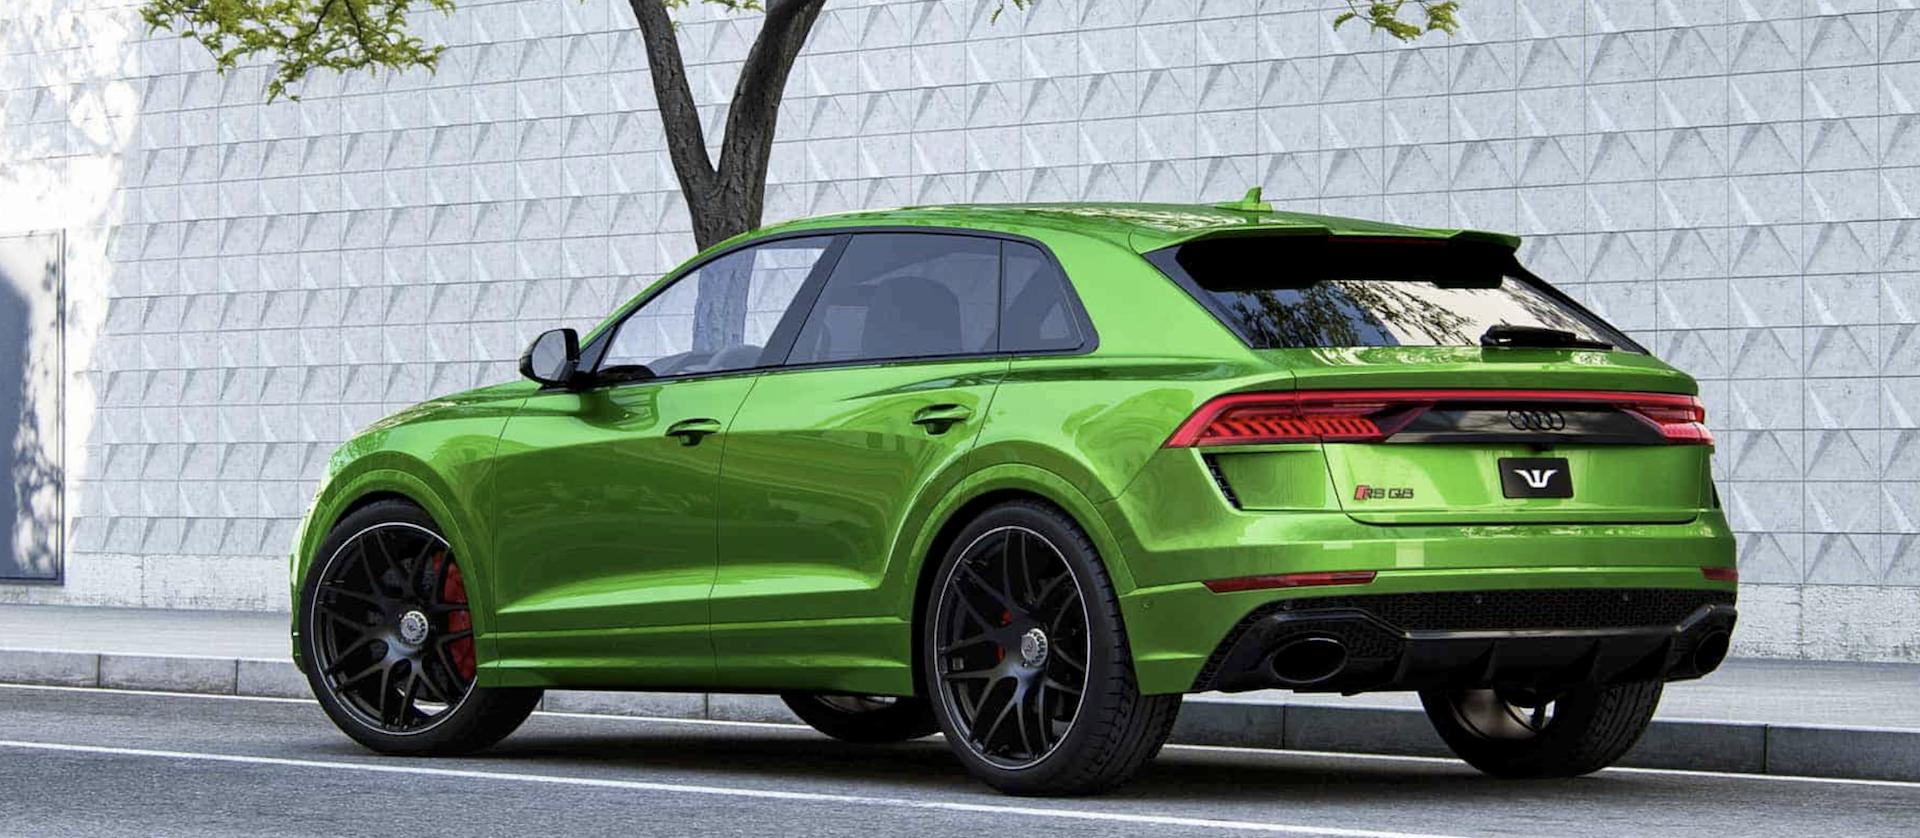 Audi Rs Q8 Wheelsandmore 3